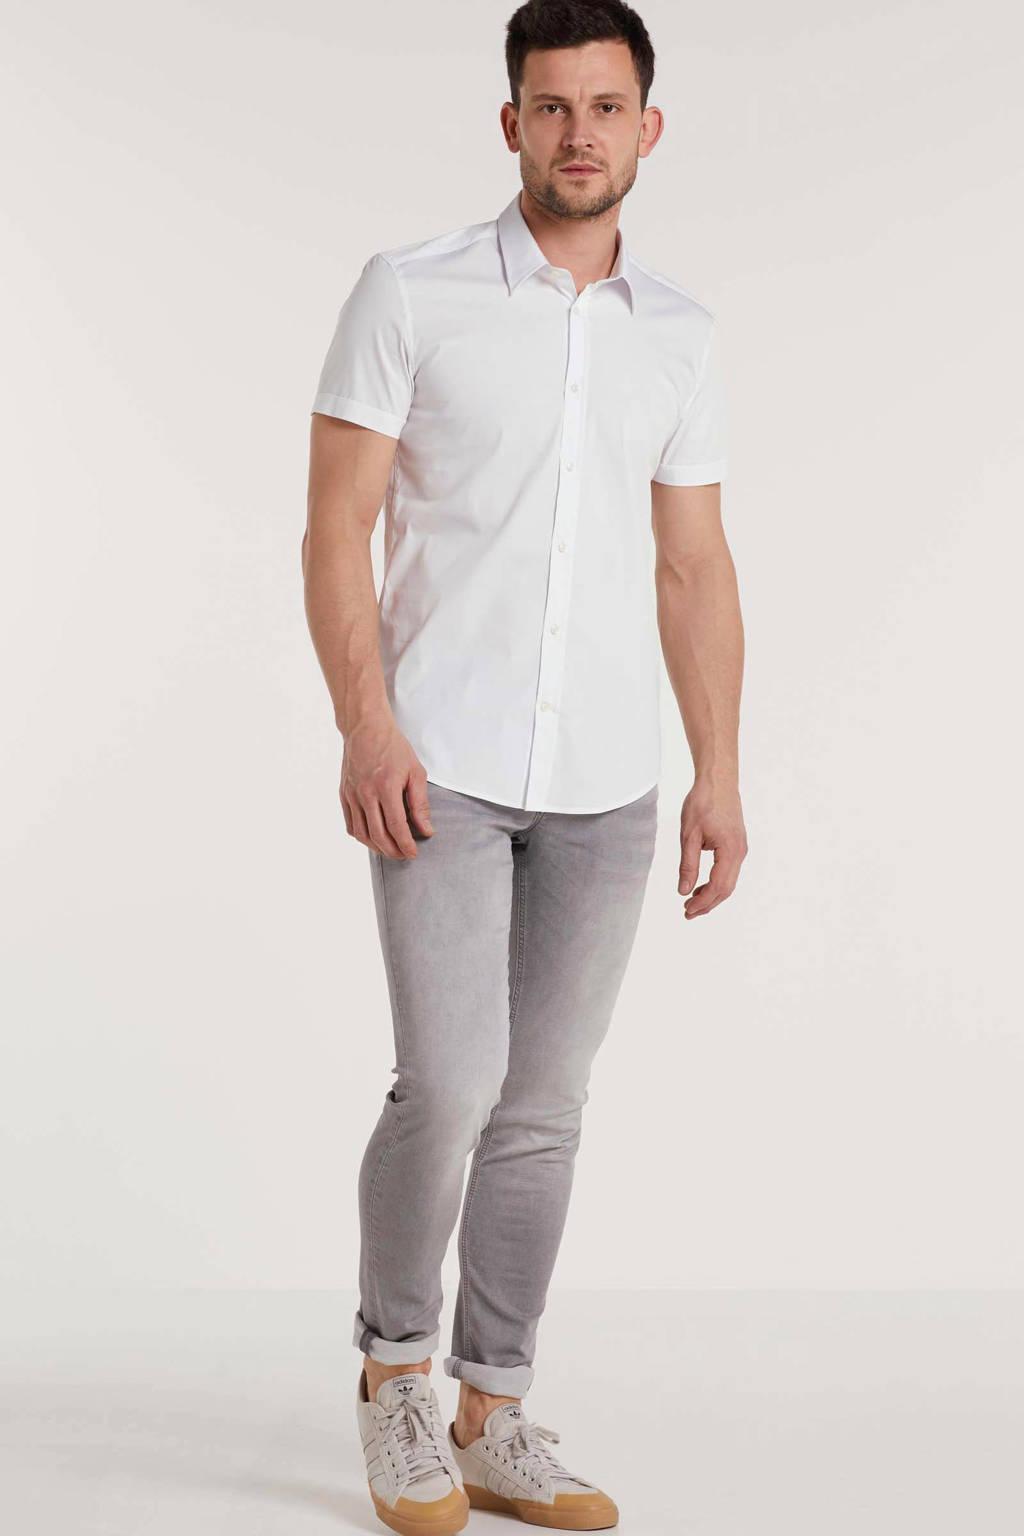 Antony Morato tapered fit jeans 9001-greey steel, 9001-Greey Steel